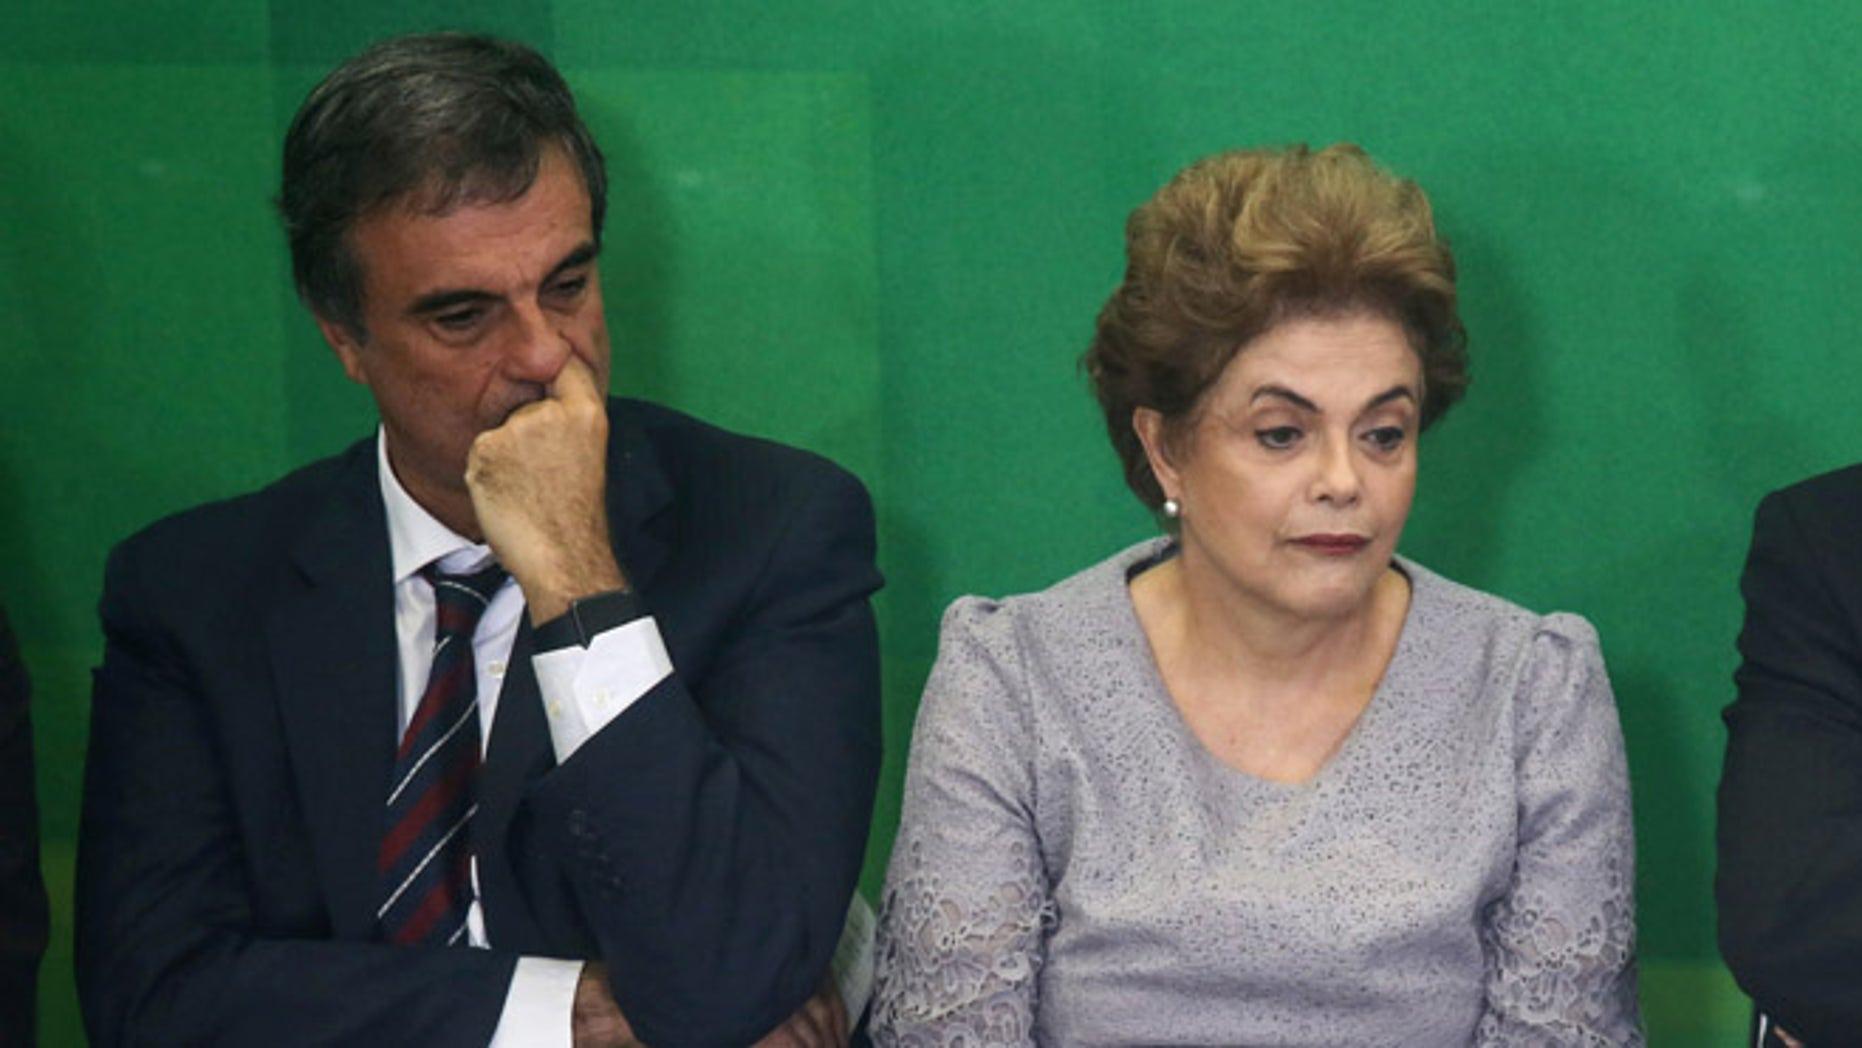 Brazilian President Dilma Rousseff and Attorney General Jose Eduardo Cardozo on March 22, 2016.